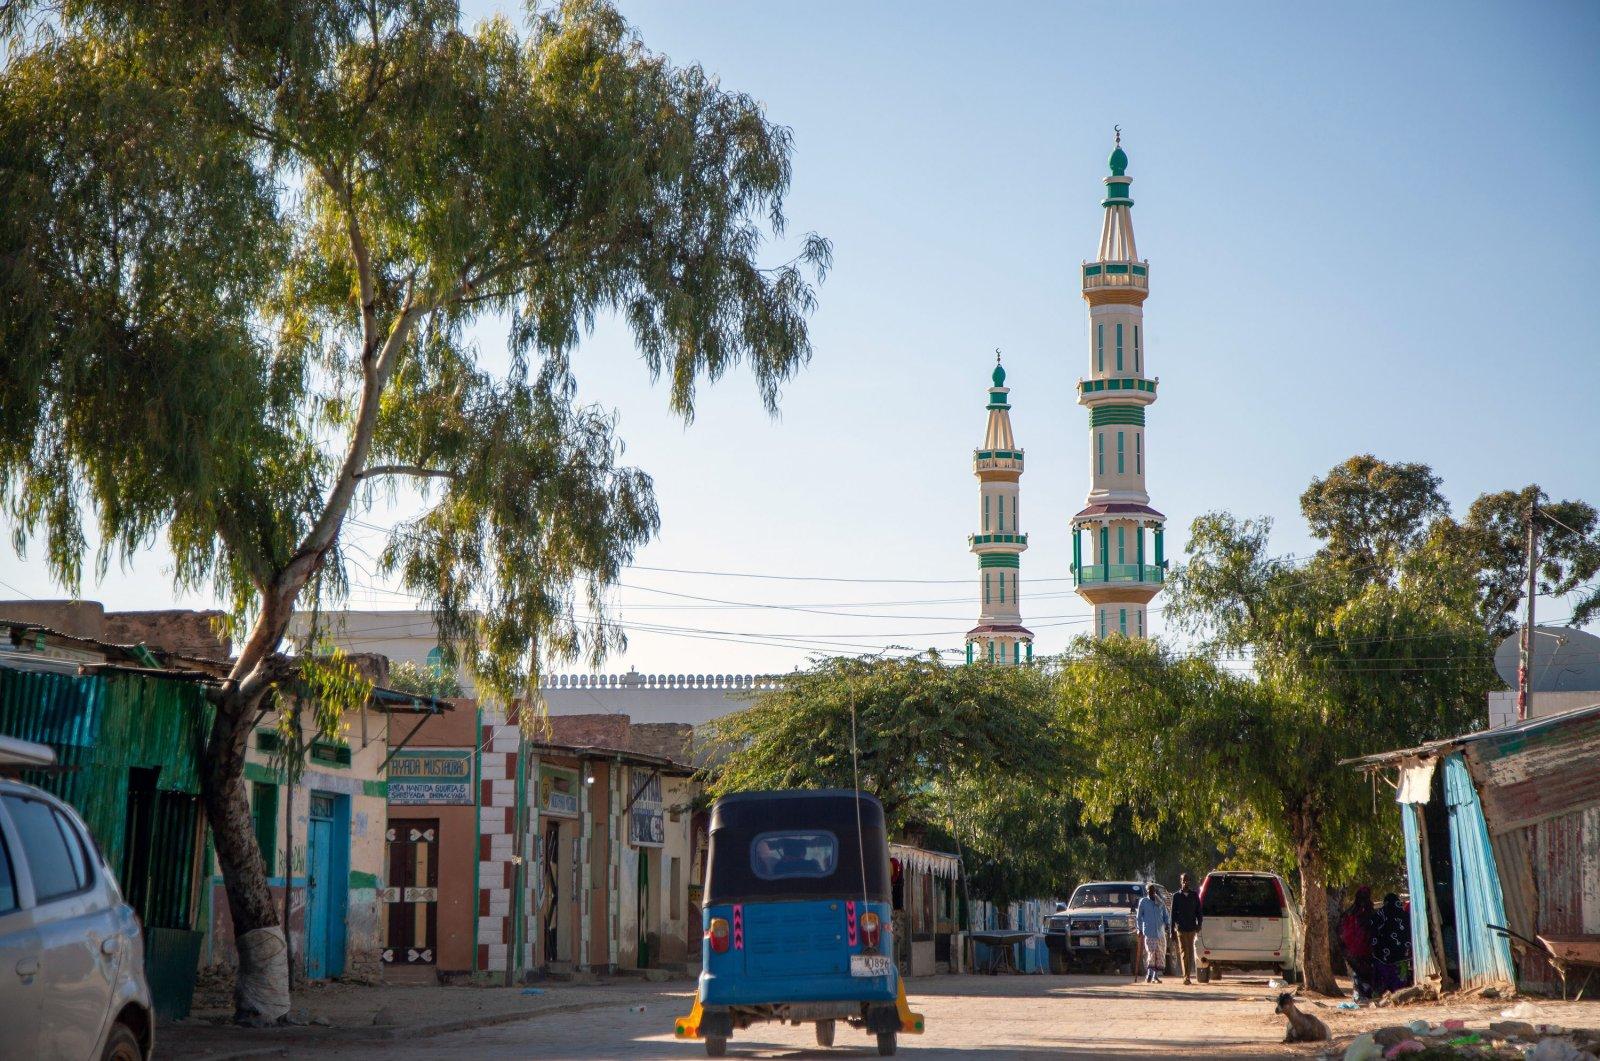 City streets during the coronavirus pandemic, Mogadishu, Somalia, Dec. 14, 2020. (Reuters Photo)